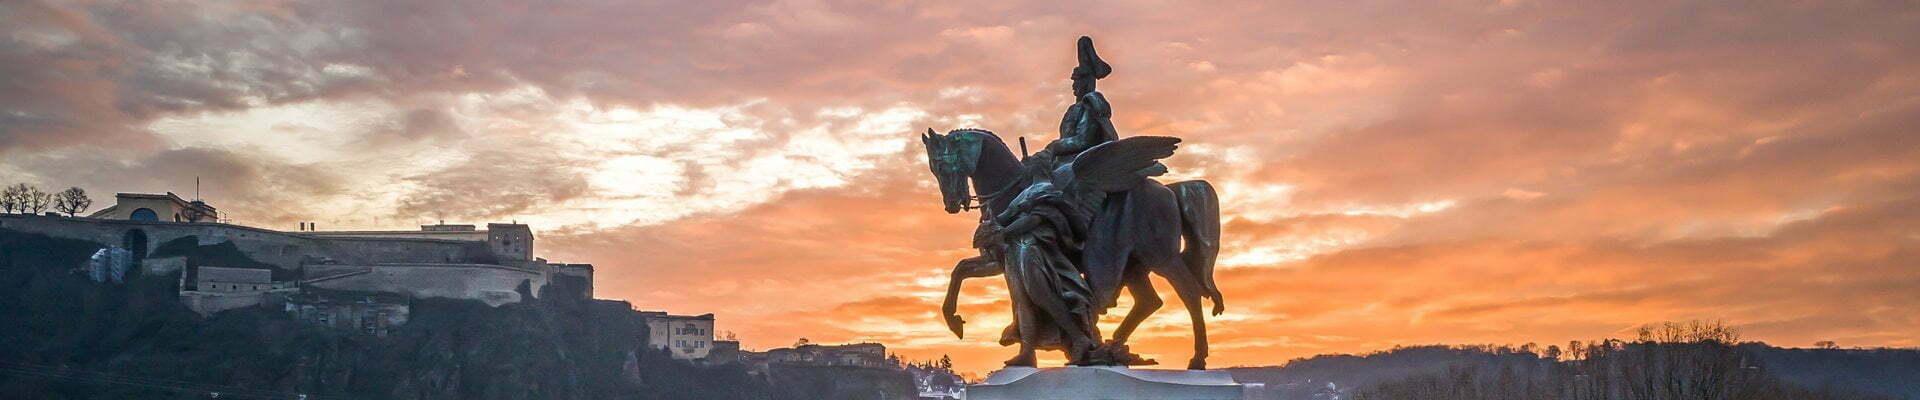 The Kaiser Wilhelm memorial at 'German Corner' in Koblenz.